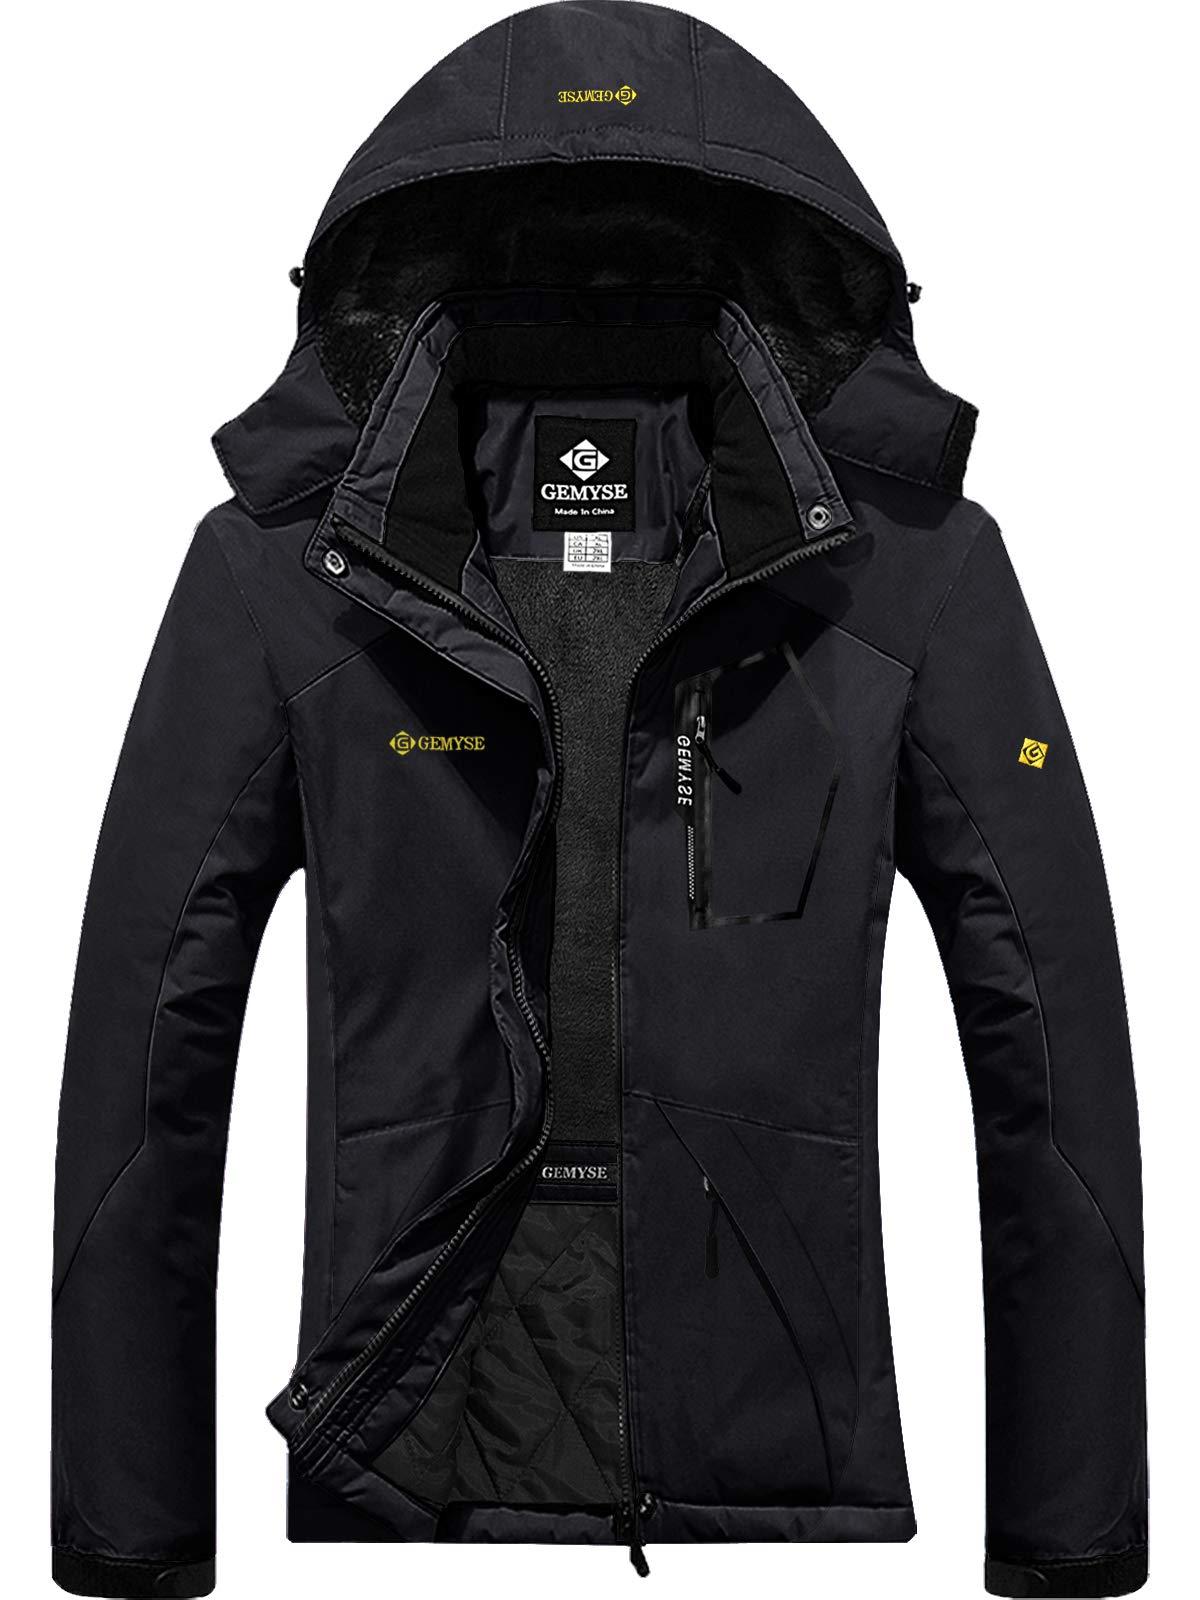 GEMYSE Women's Mountain Waterproof Ski Snow Jacket Winter Windproof Rain Jacket (Black,XL) by GEMYSE